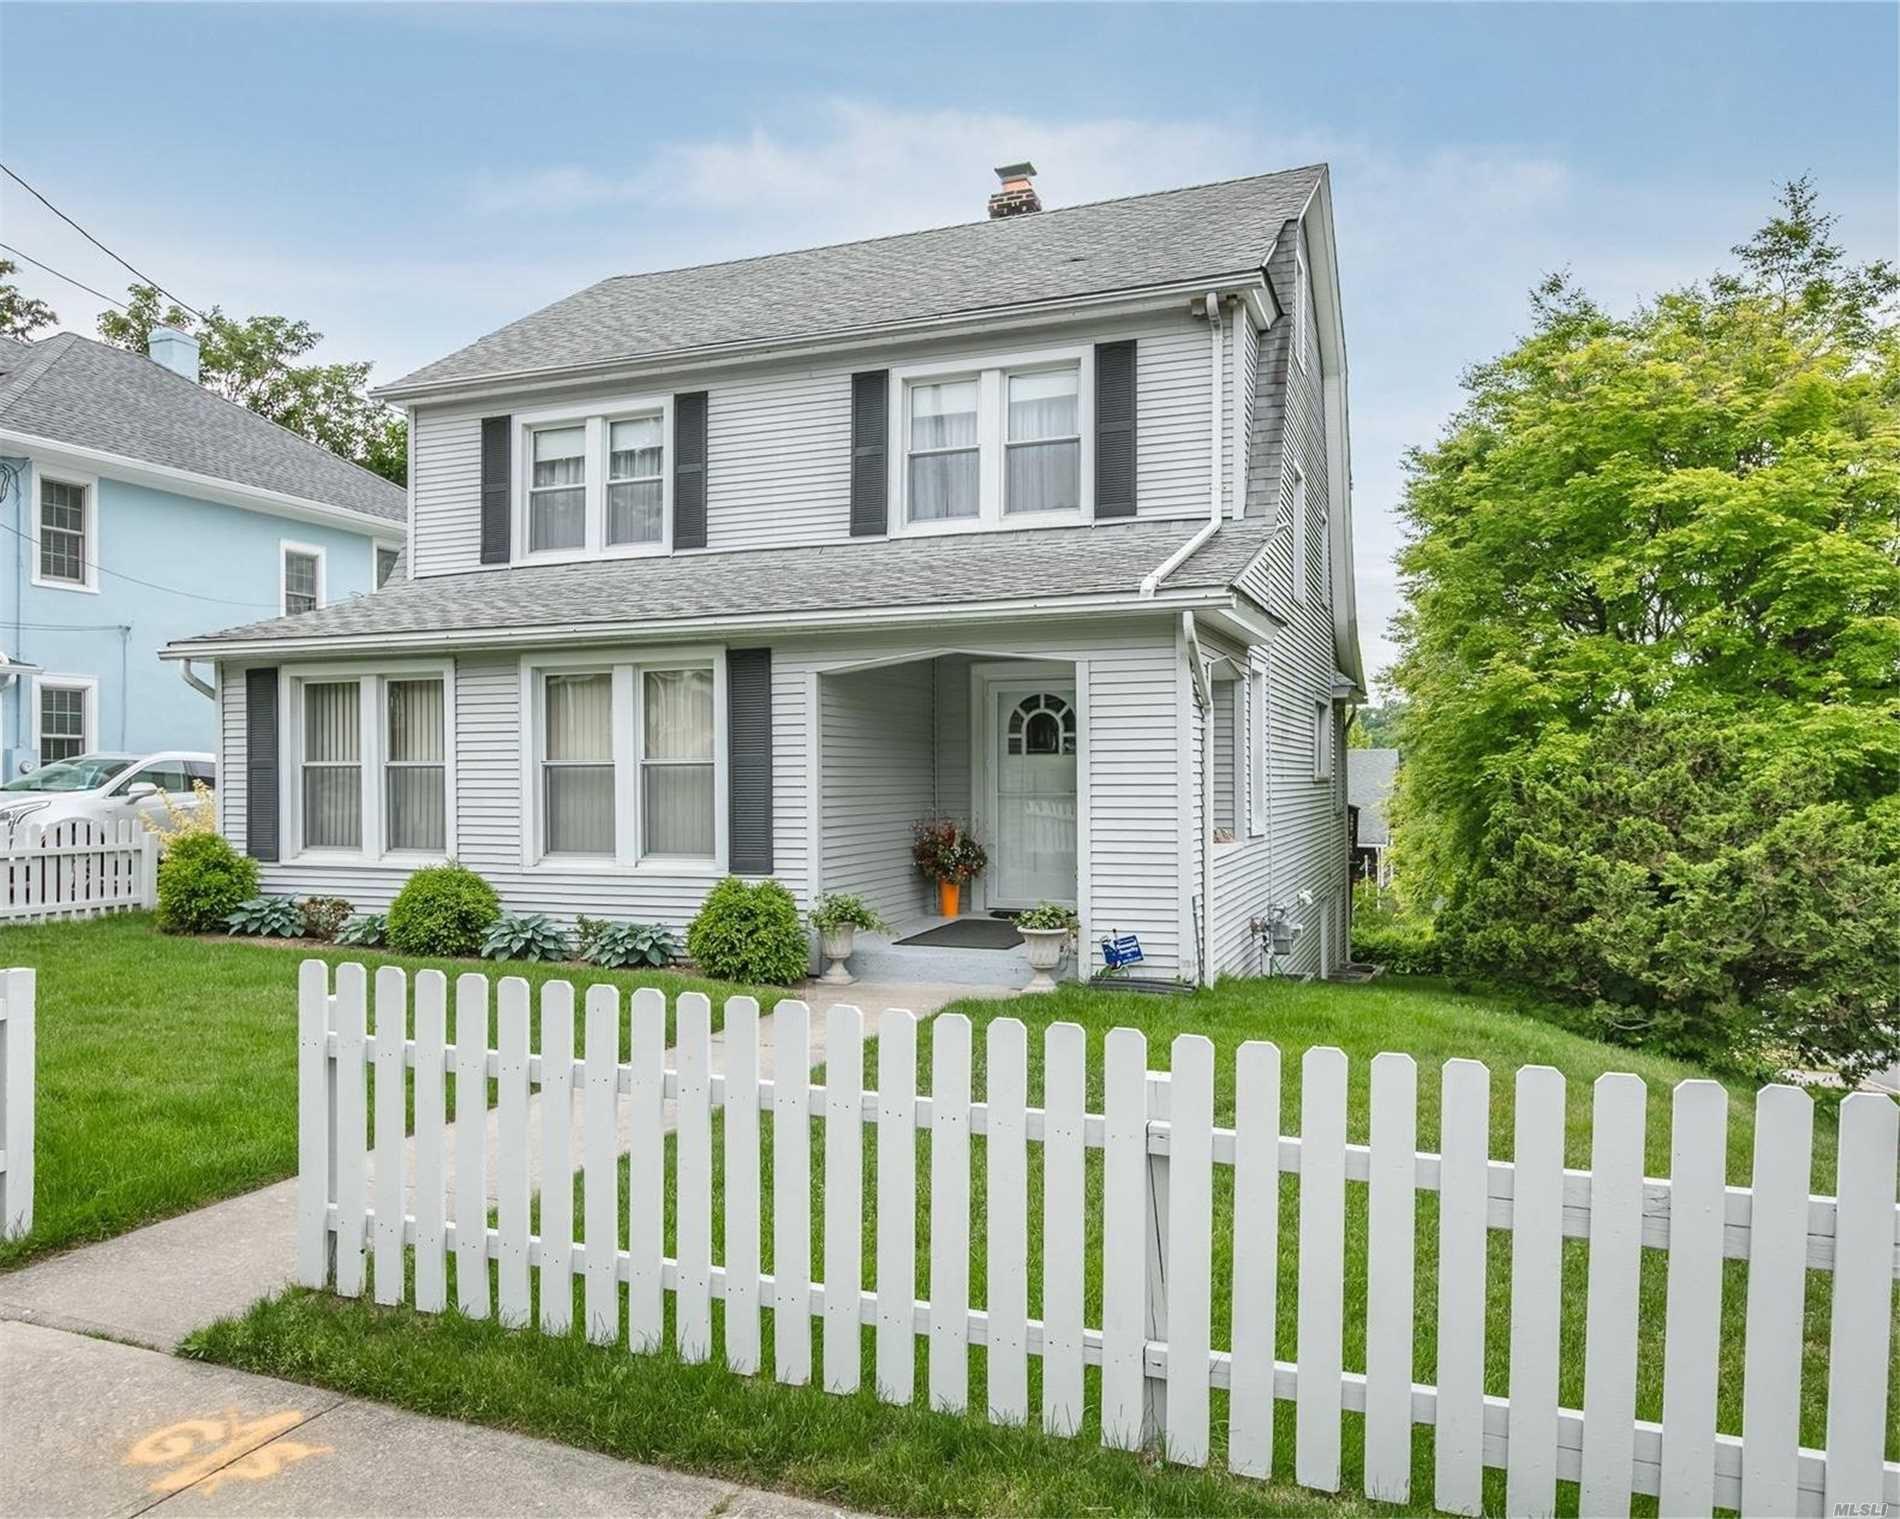 146 Anstice Street, Oyster Bay, NY 11771 - MLS#: 3219613